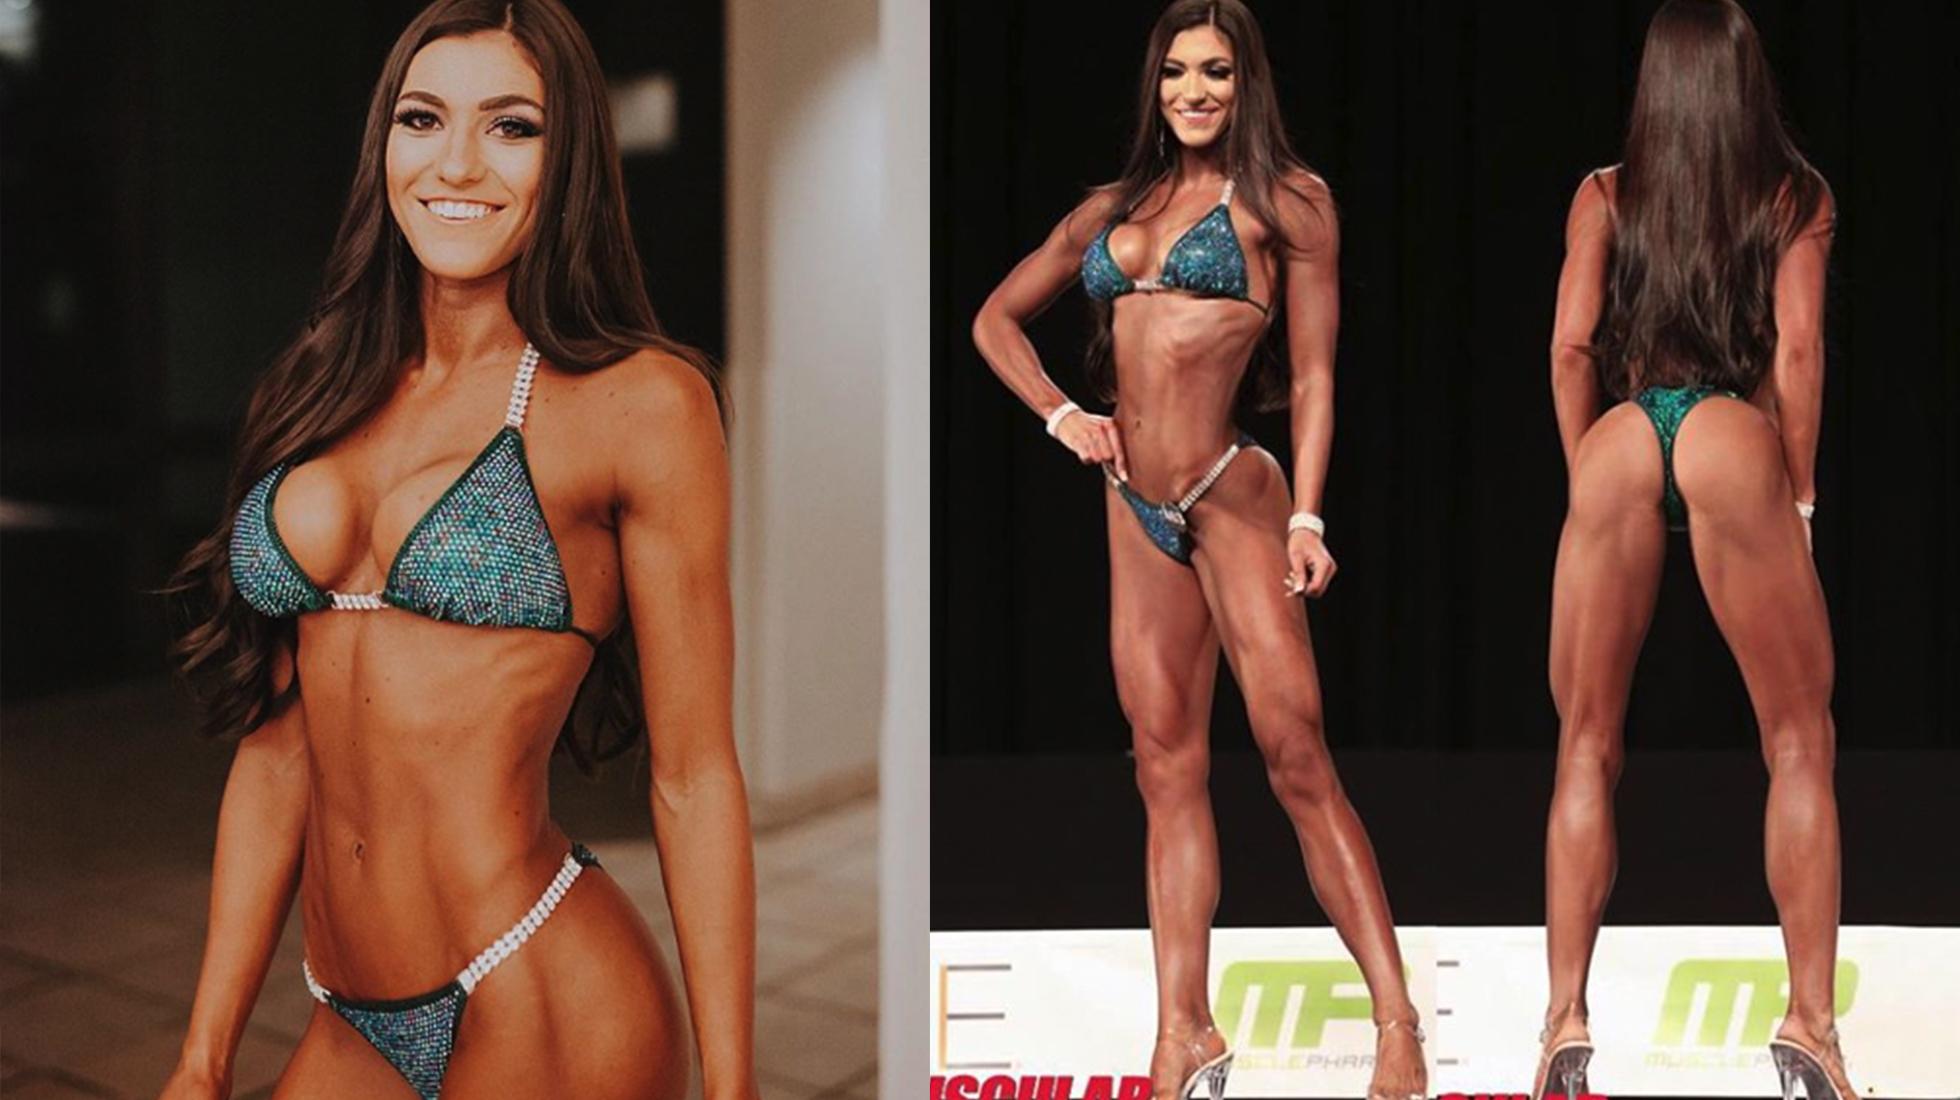 lauren dannenmiller ifbb bikini pro anastasiaova posing coach skype individual.jpg